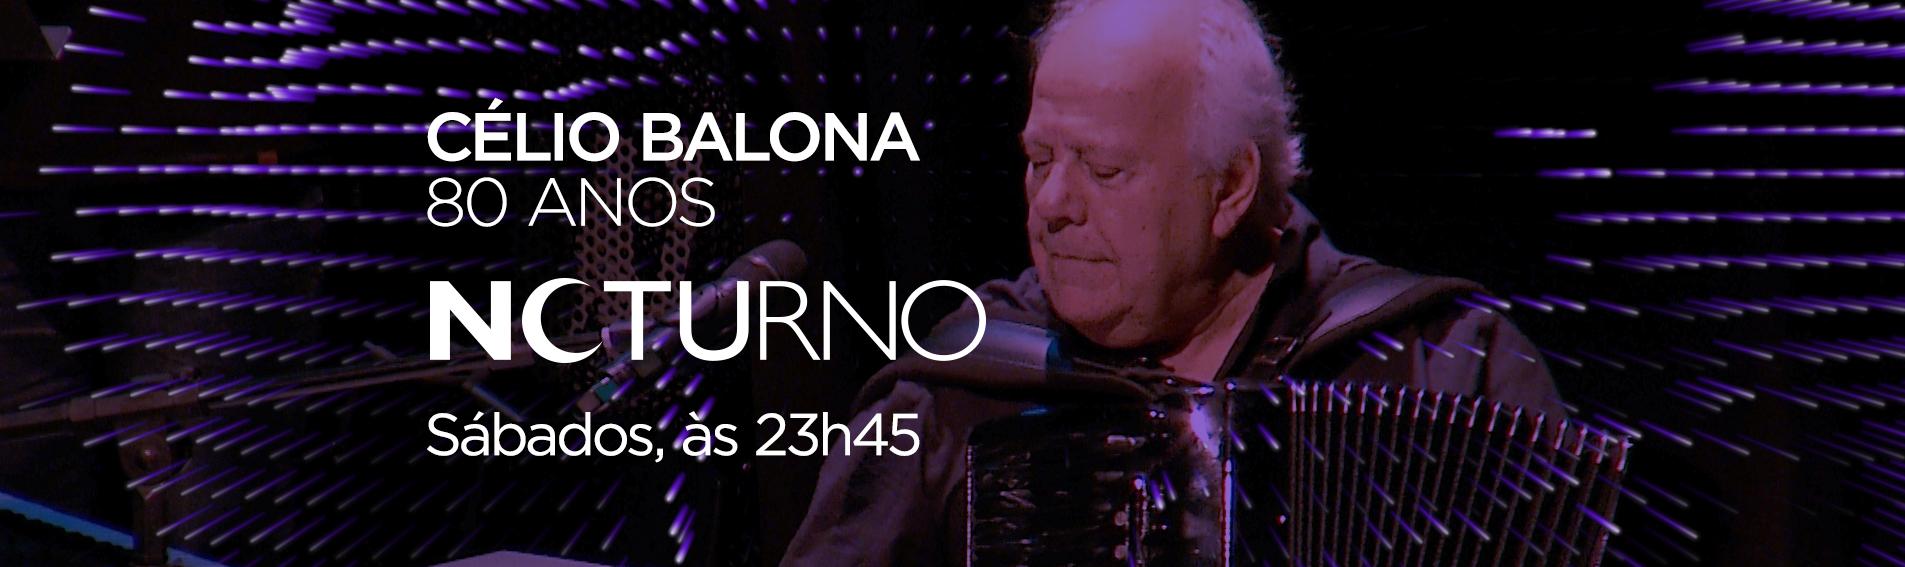 banner_noturno_celinobalona